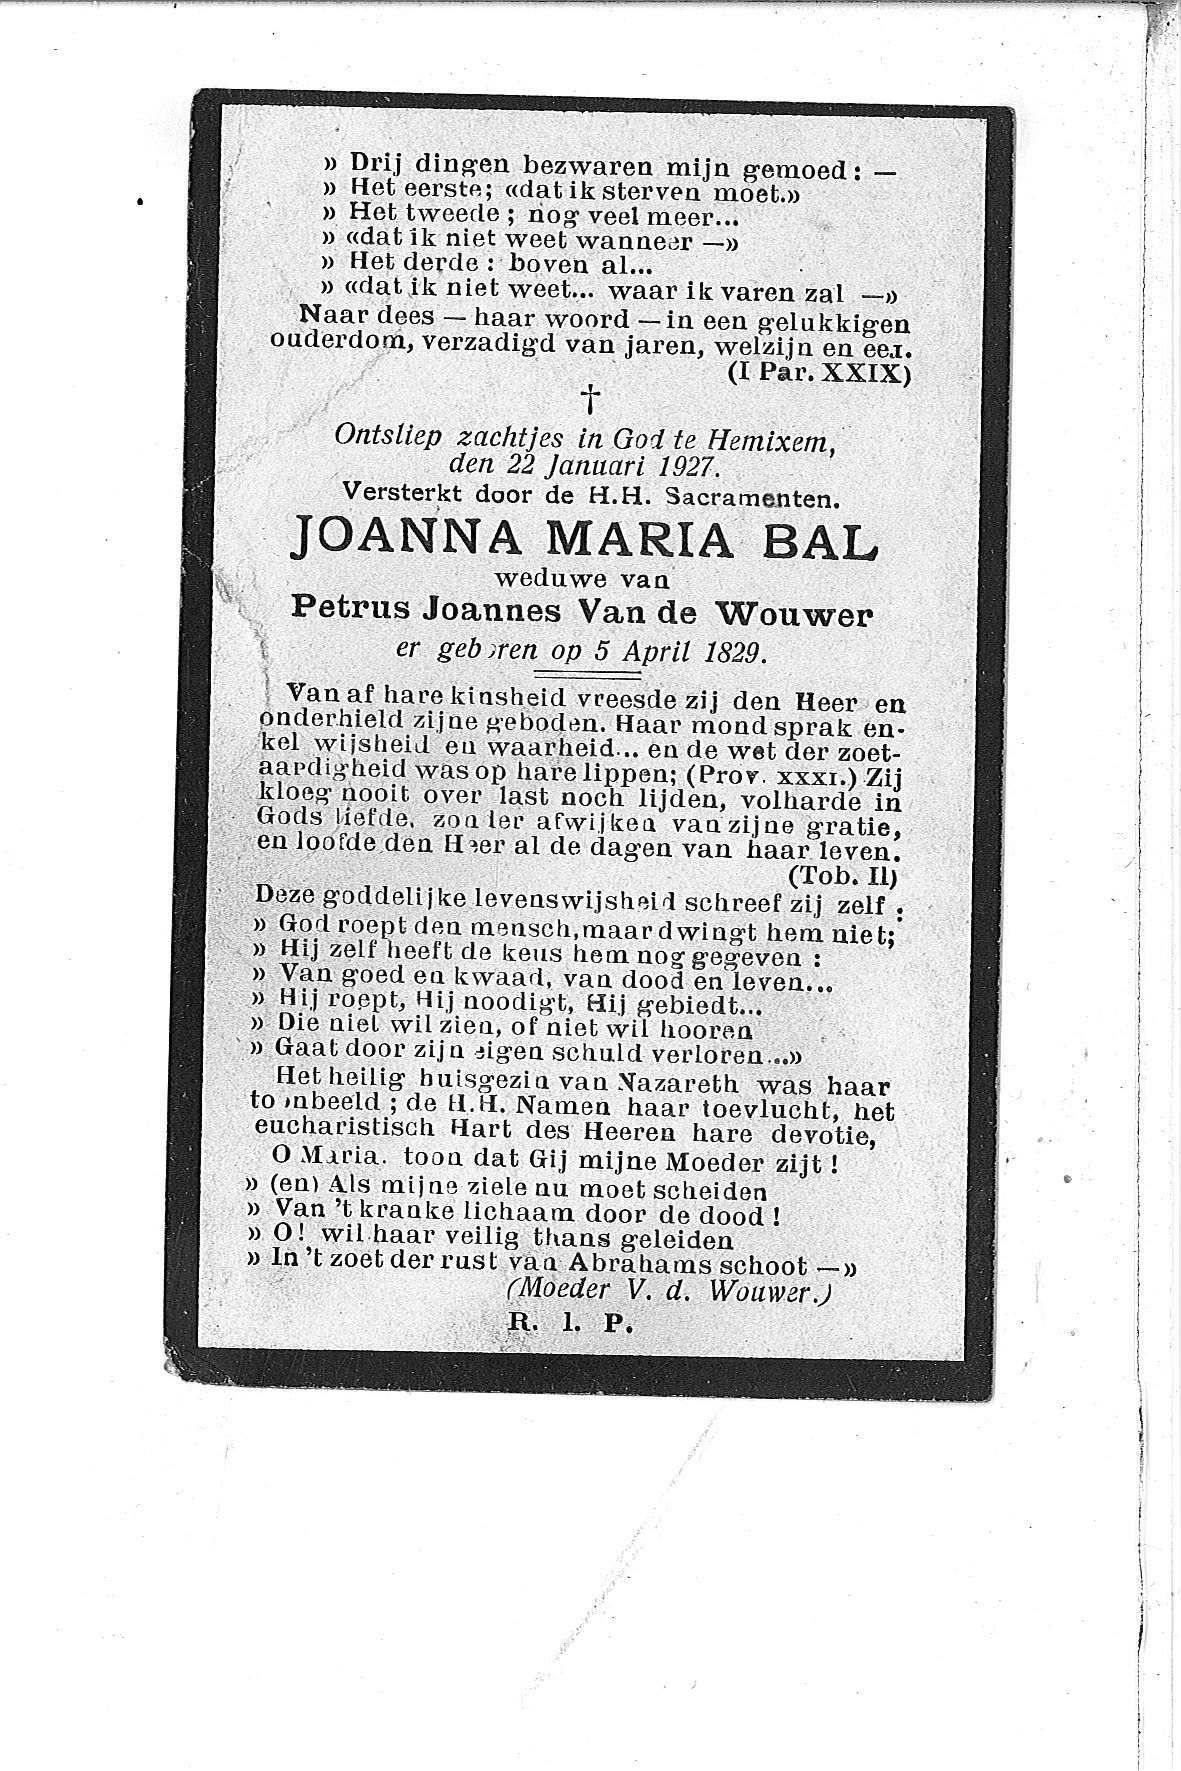 Joanna-Maria(1927)20101006133005_00030.jpg